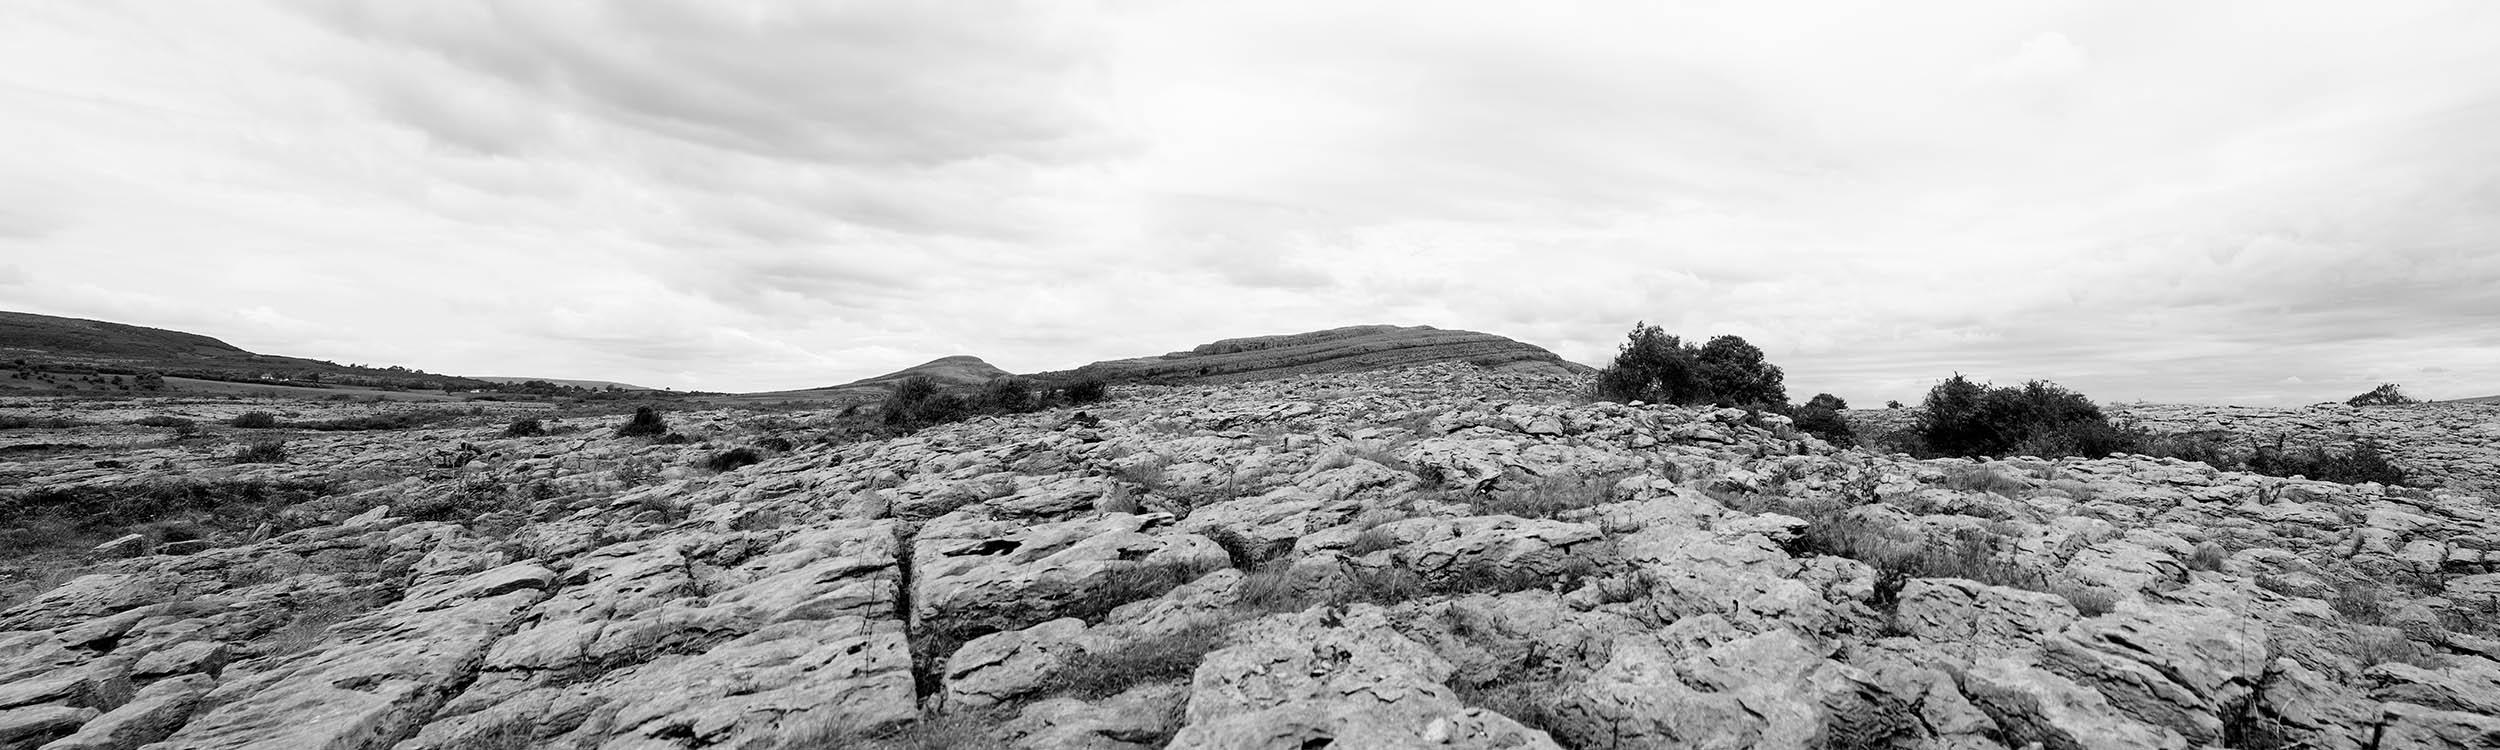 IRELAND_CLARE_THEBURREN_0008